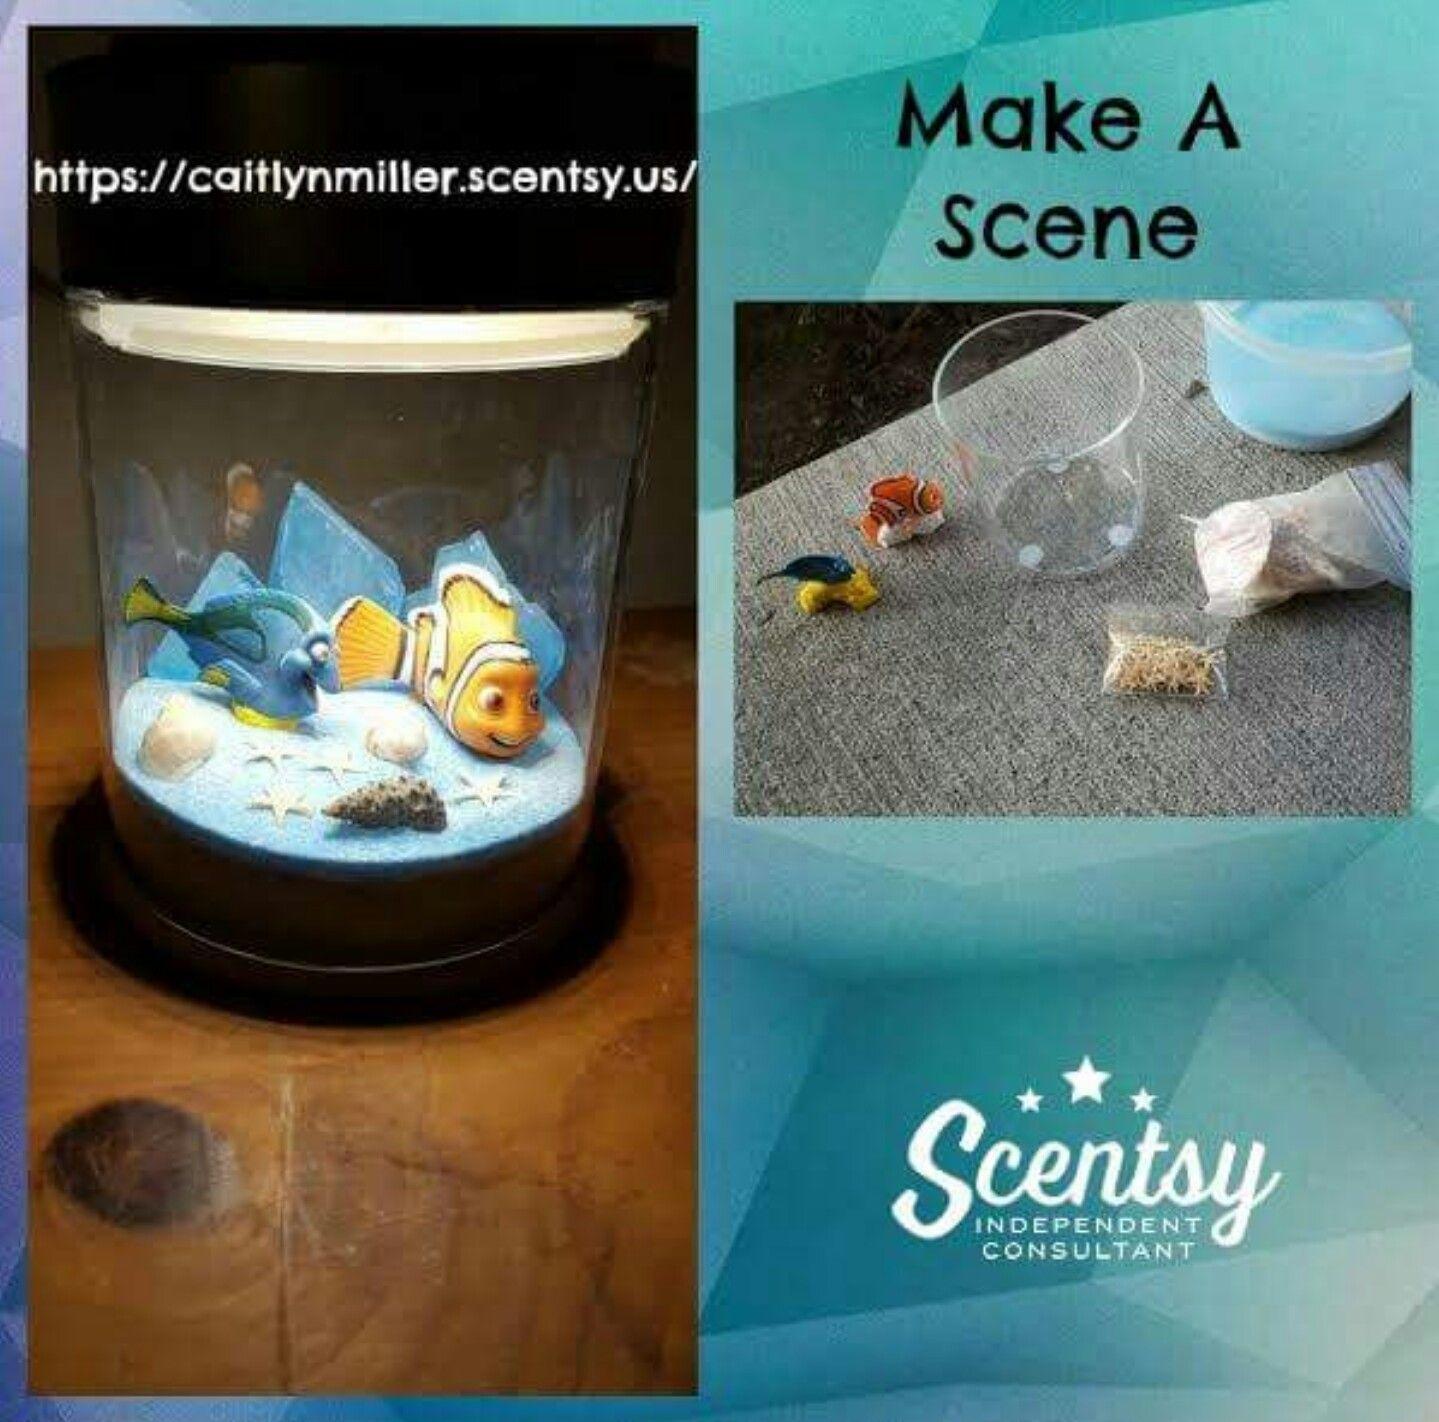 Make A Scene Scentsy 2016 Pinterest Scentsy Scene And Decorating